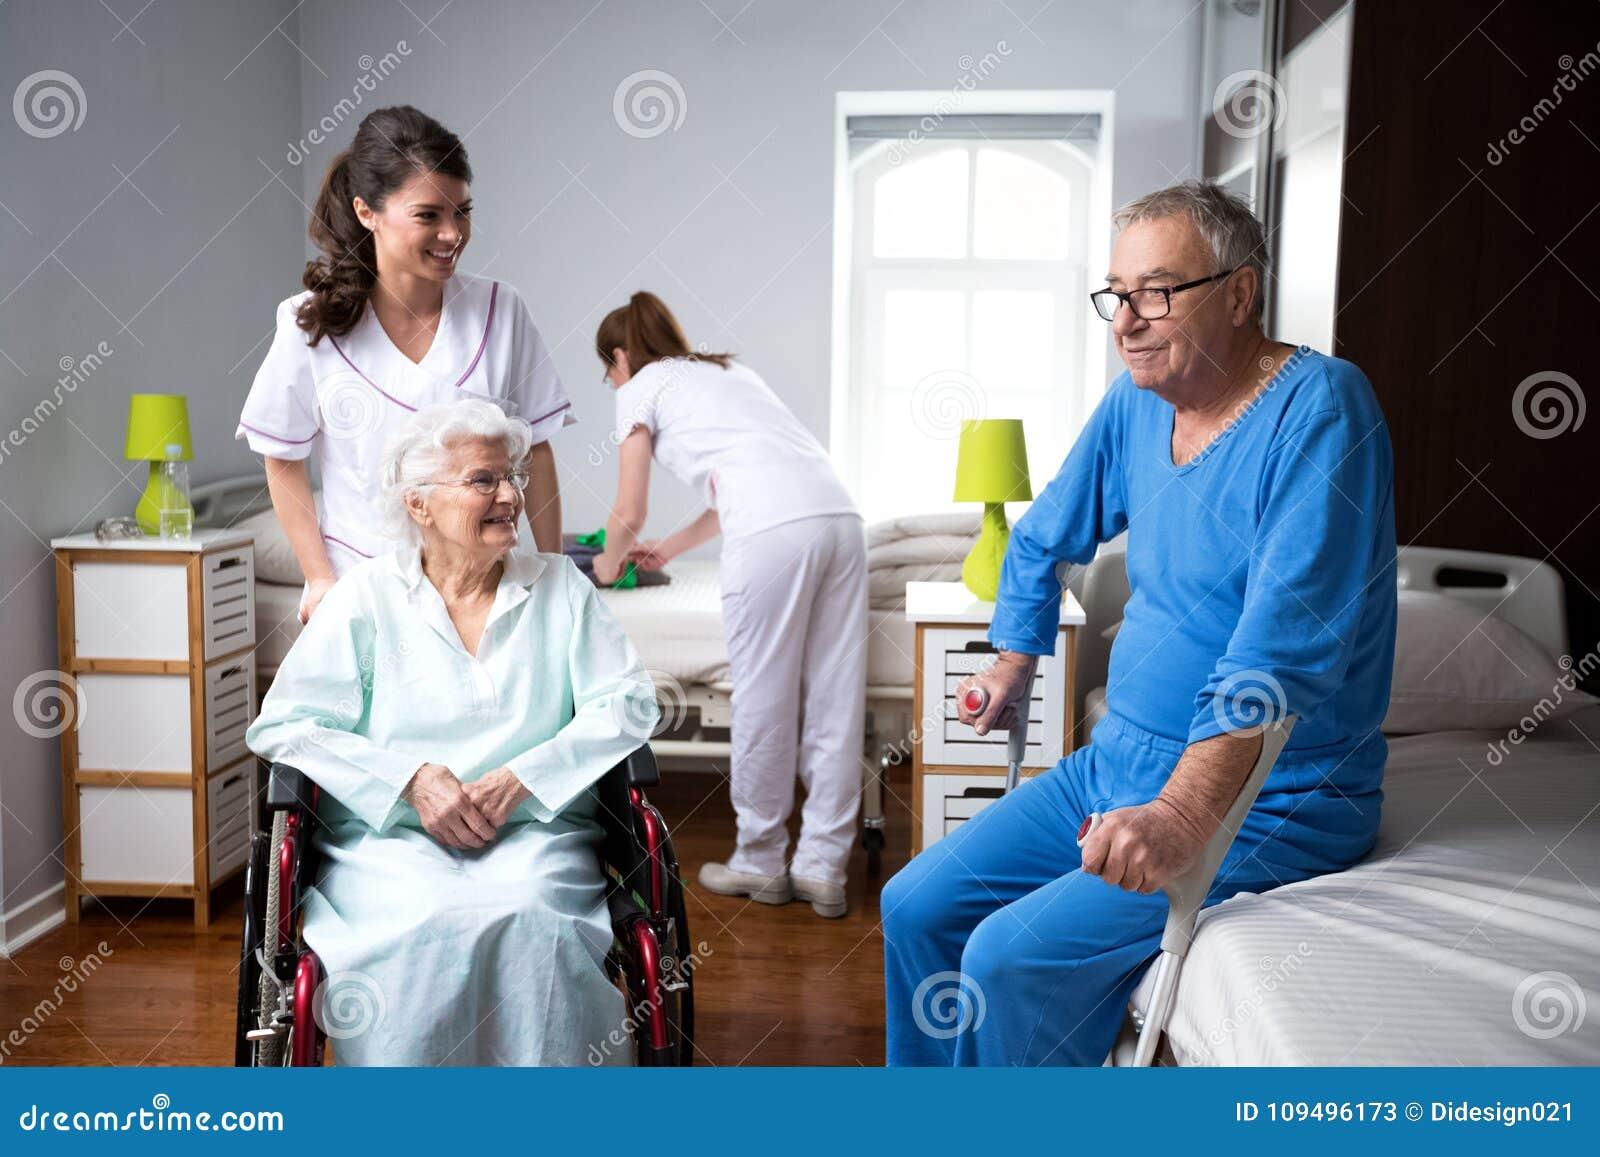 Nursing care of the elderly pdf